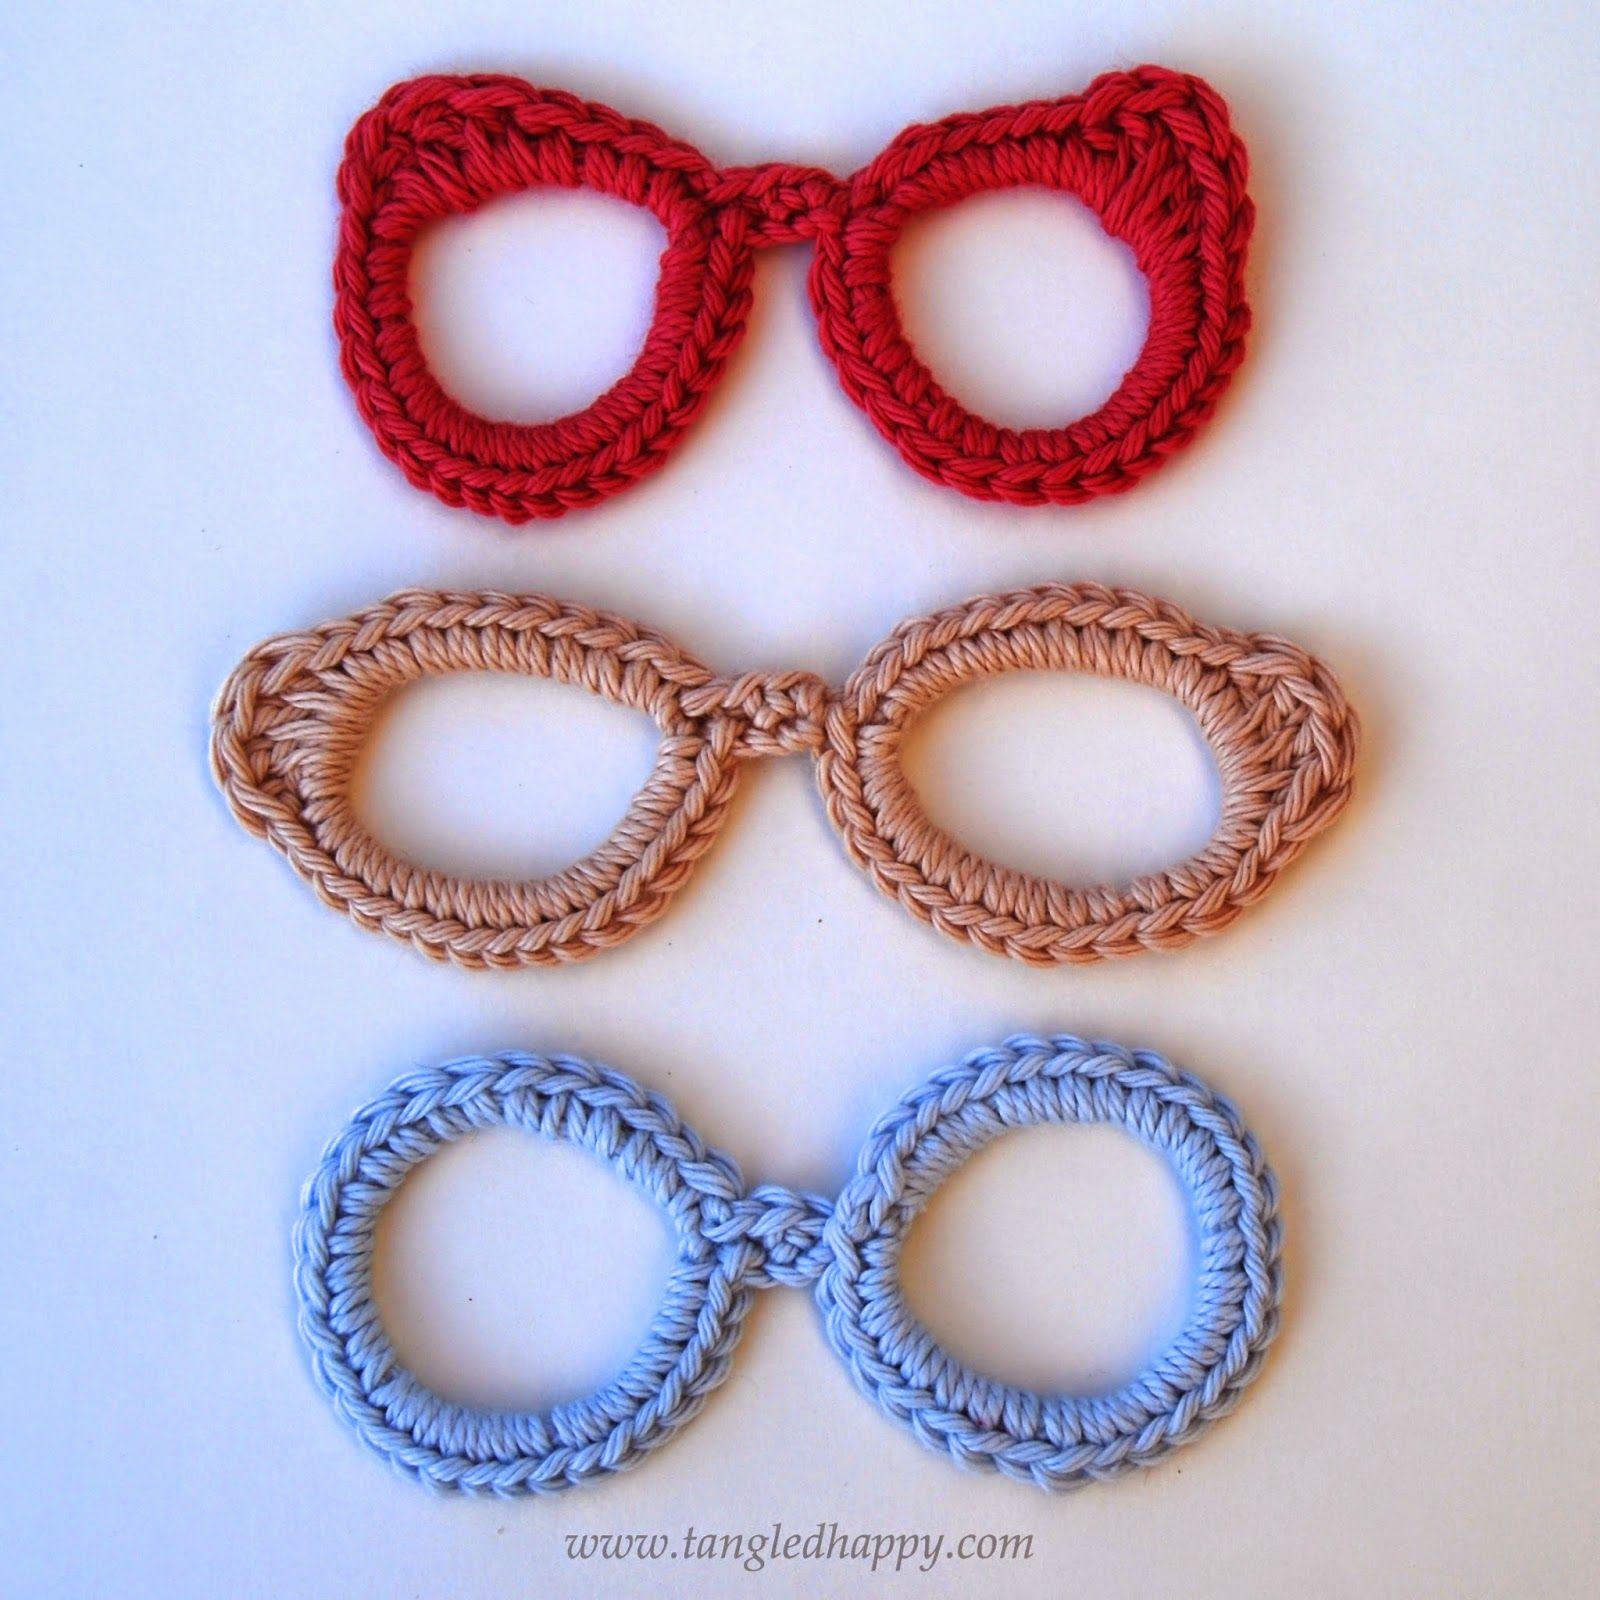 Eyeglasses Applique {Free Crochet Patternn} | ganxet i trapillo ...